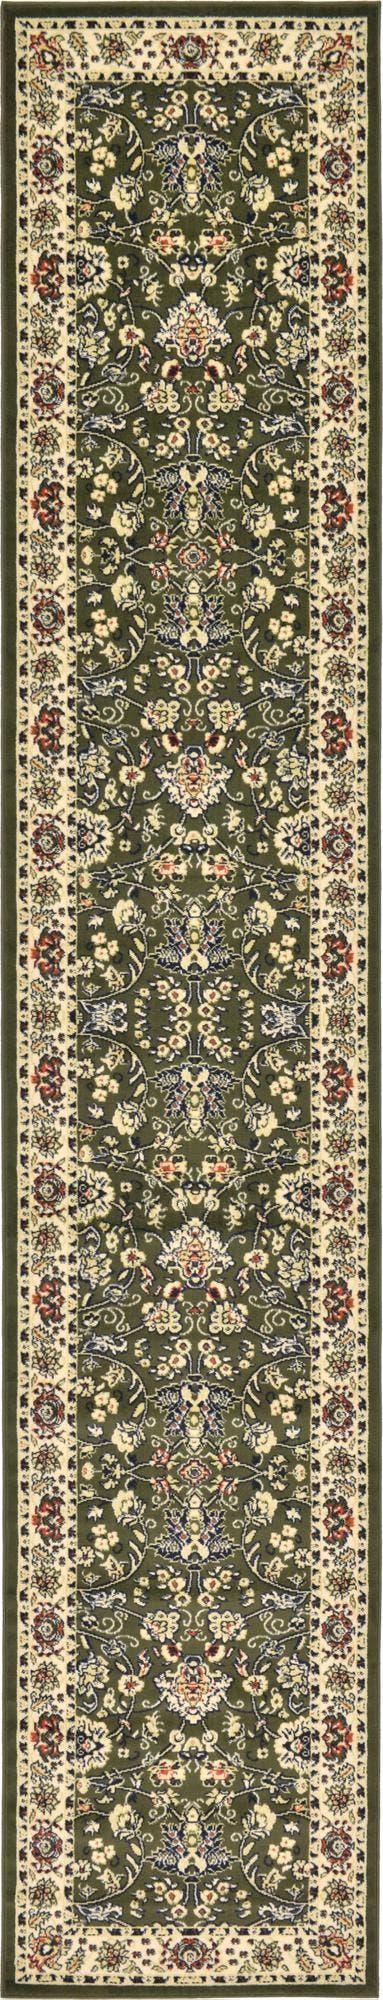 3' x 16' 5 Kashan Design Runner Rug main image